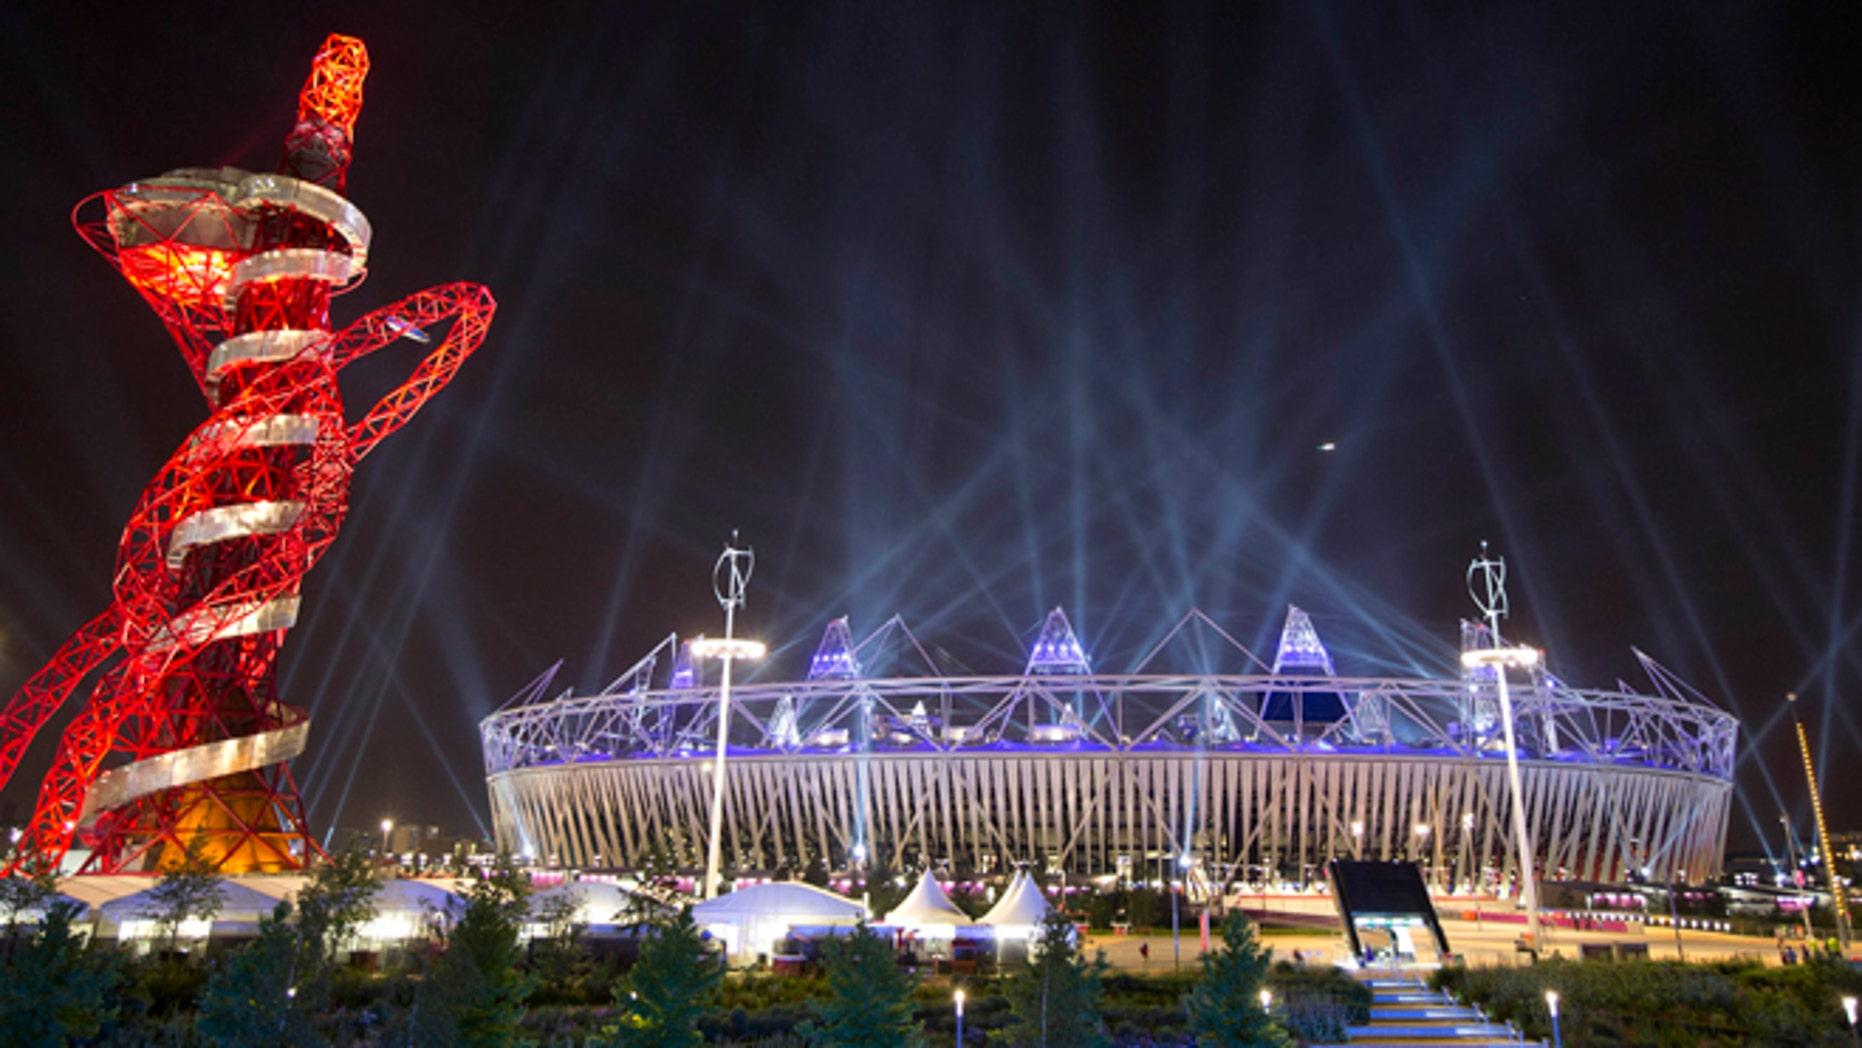 Olympic Stadium in London. (AP Photo/Ben Curtis)